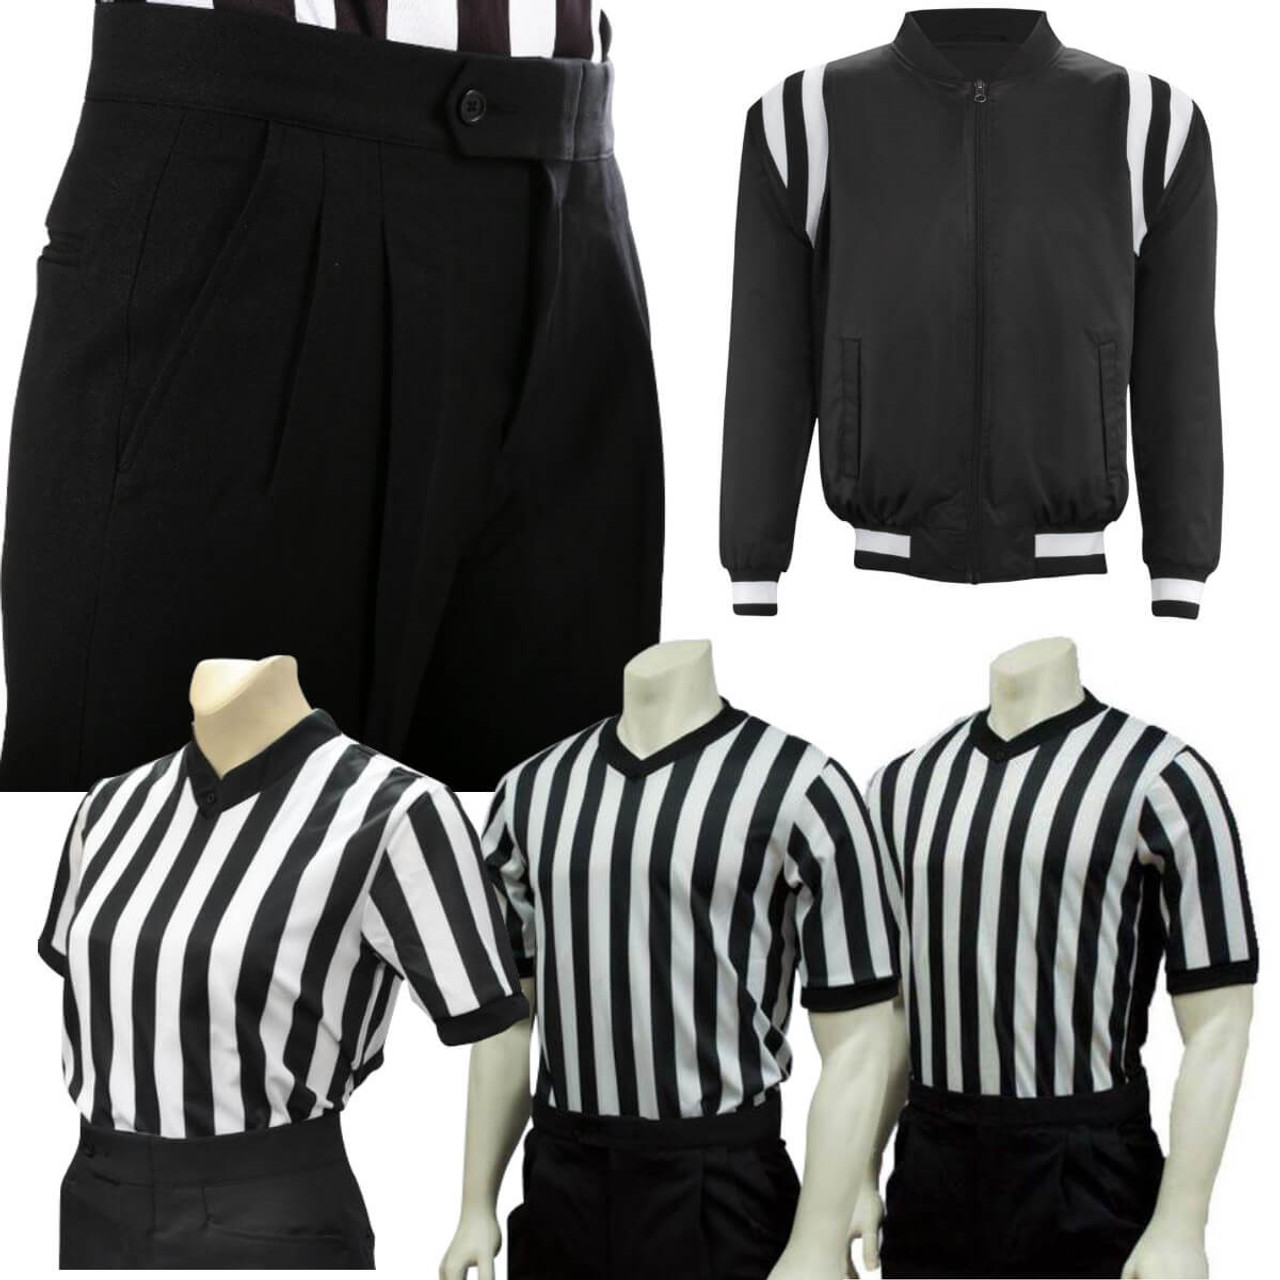 Basketball Referee Uniform Package Flat Front Slash Pocket Pants